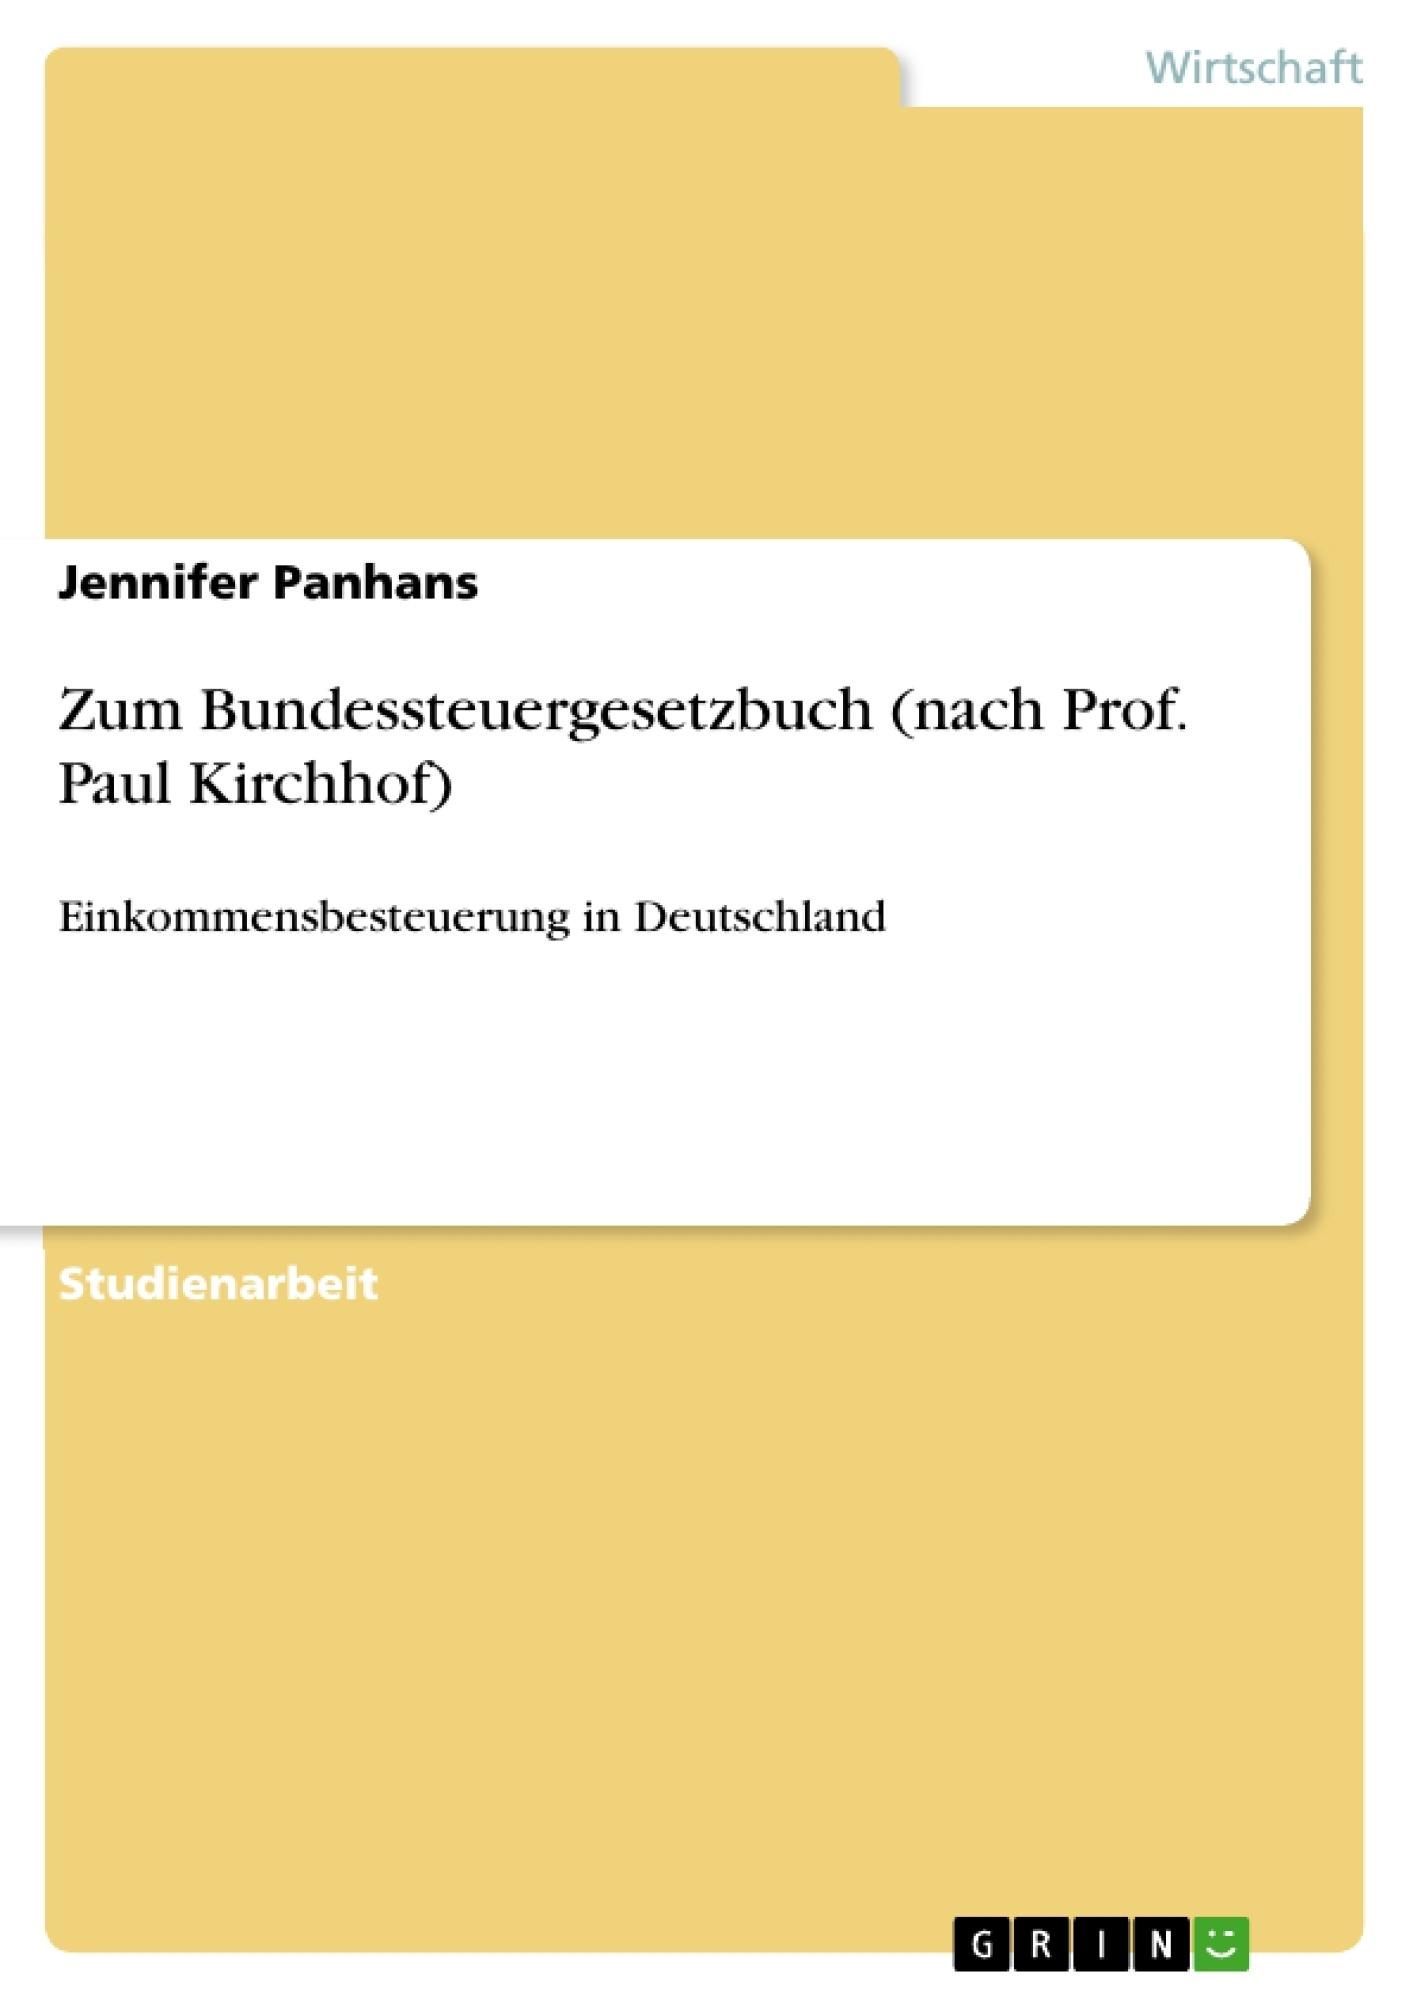 Titel: Zum Bundessteuergesetzbuch (nach Prof. Paul Kirchhof)